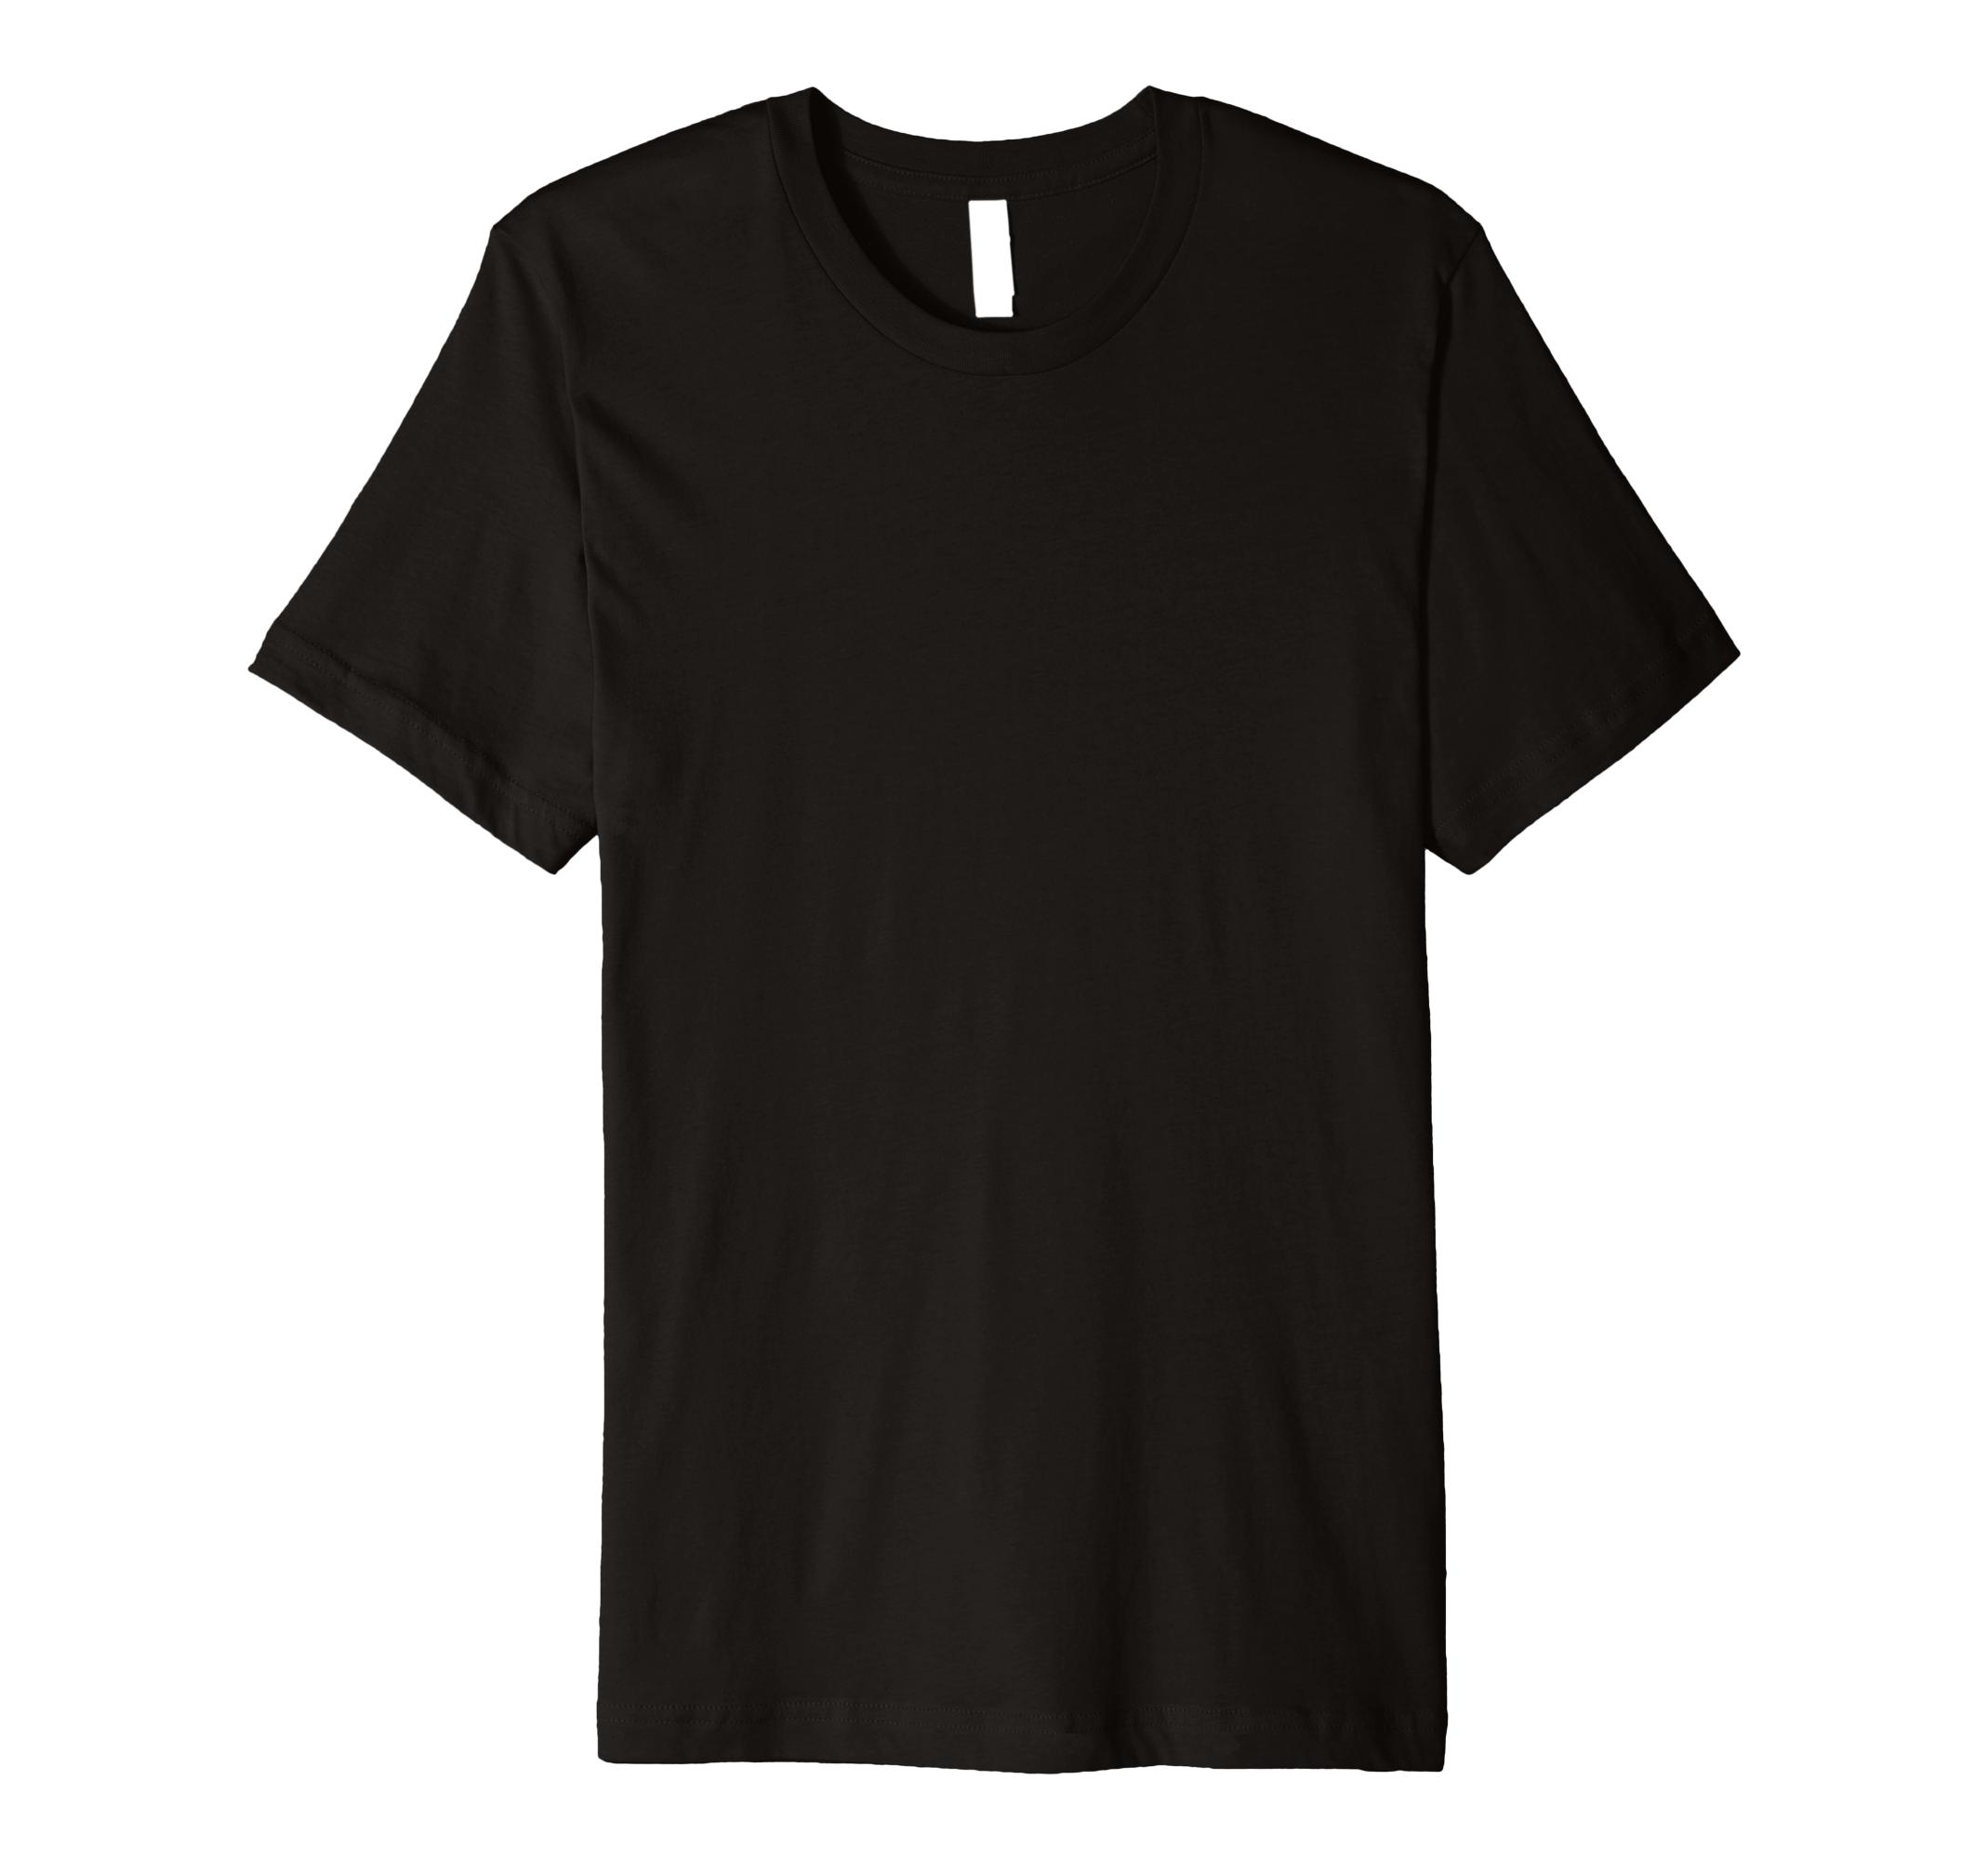 Graduation Shirt 2019 Ideas Amazon.com: Dabbing Graduation Class 2019 T Shirt Gift Ideas Girls